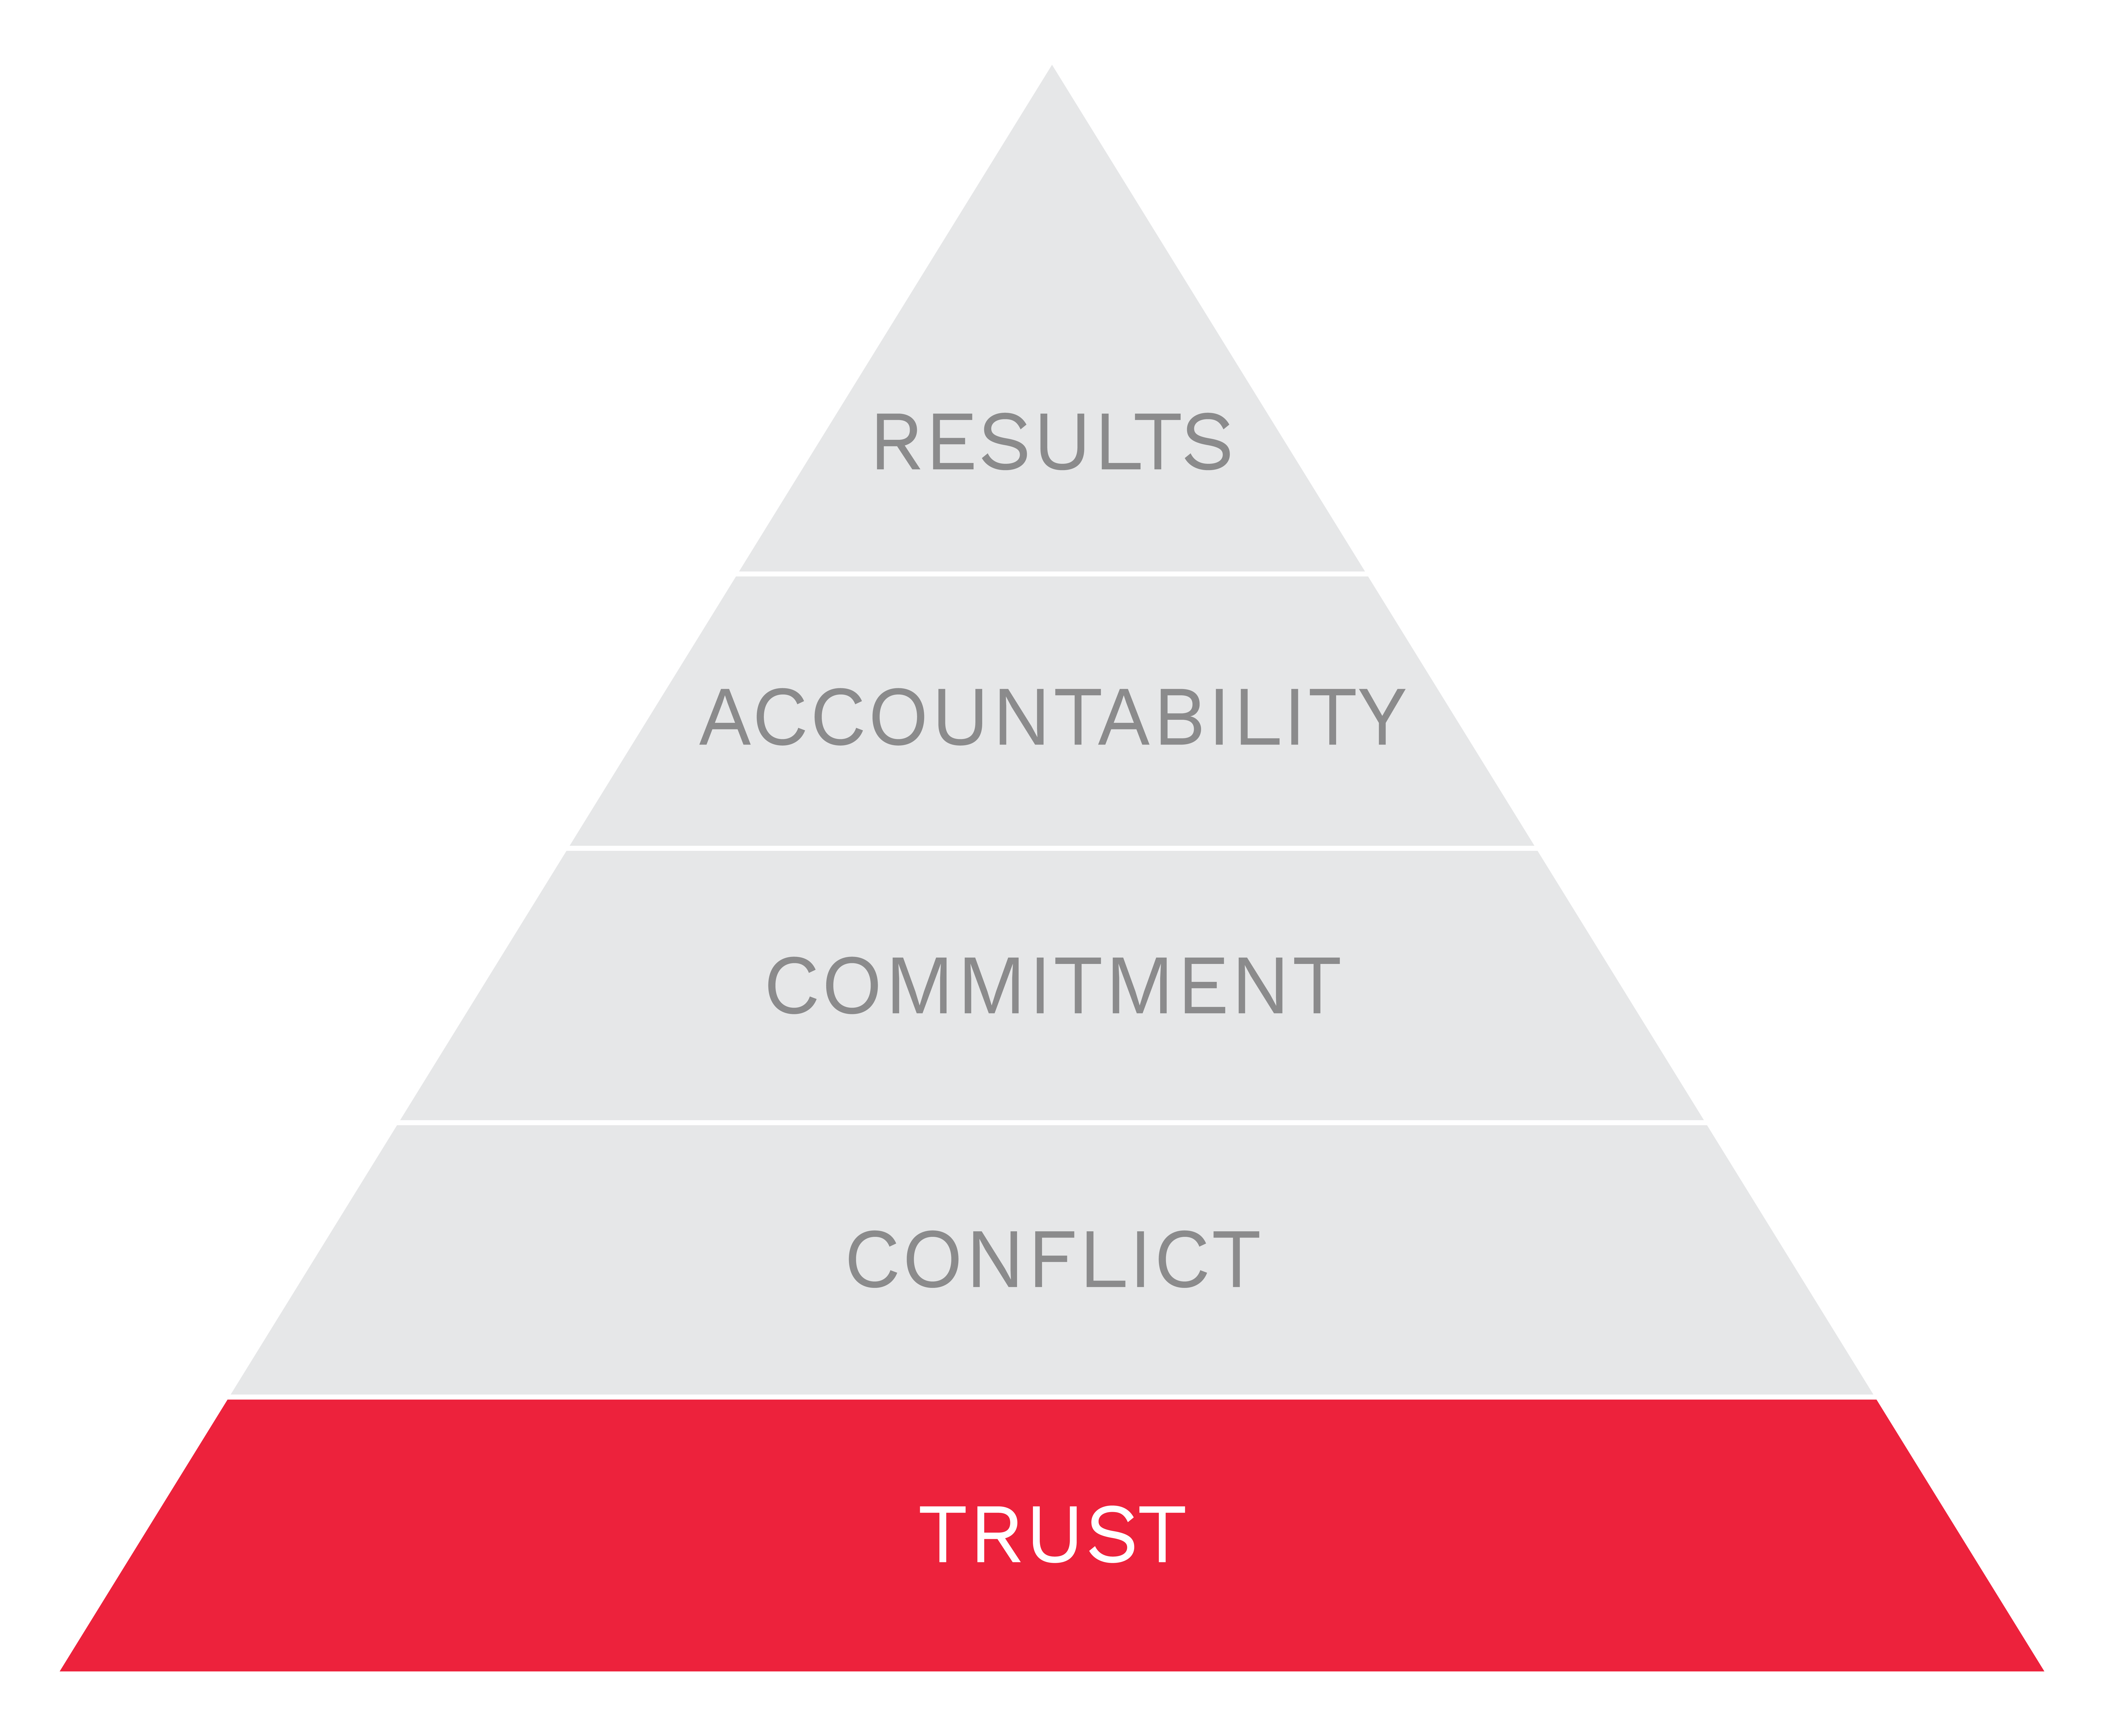 5b-branding-pyramid-trust.png